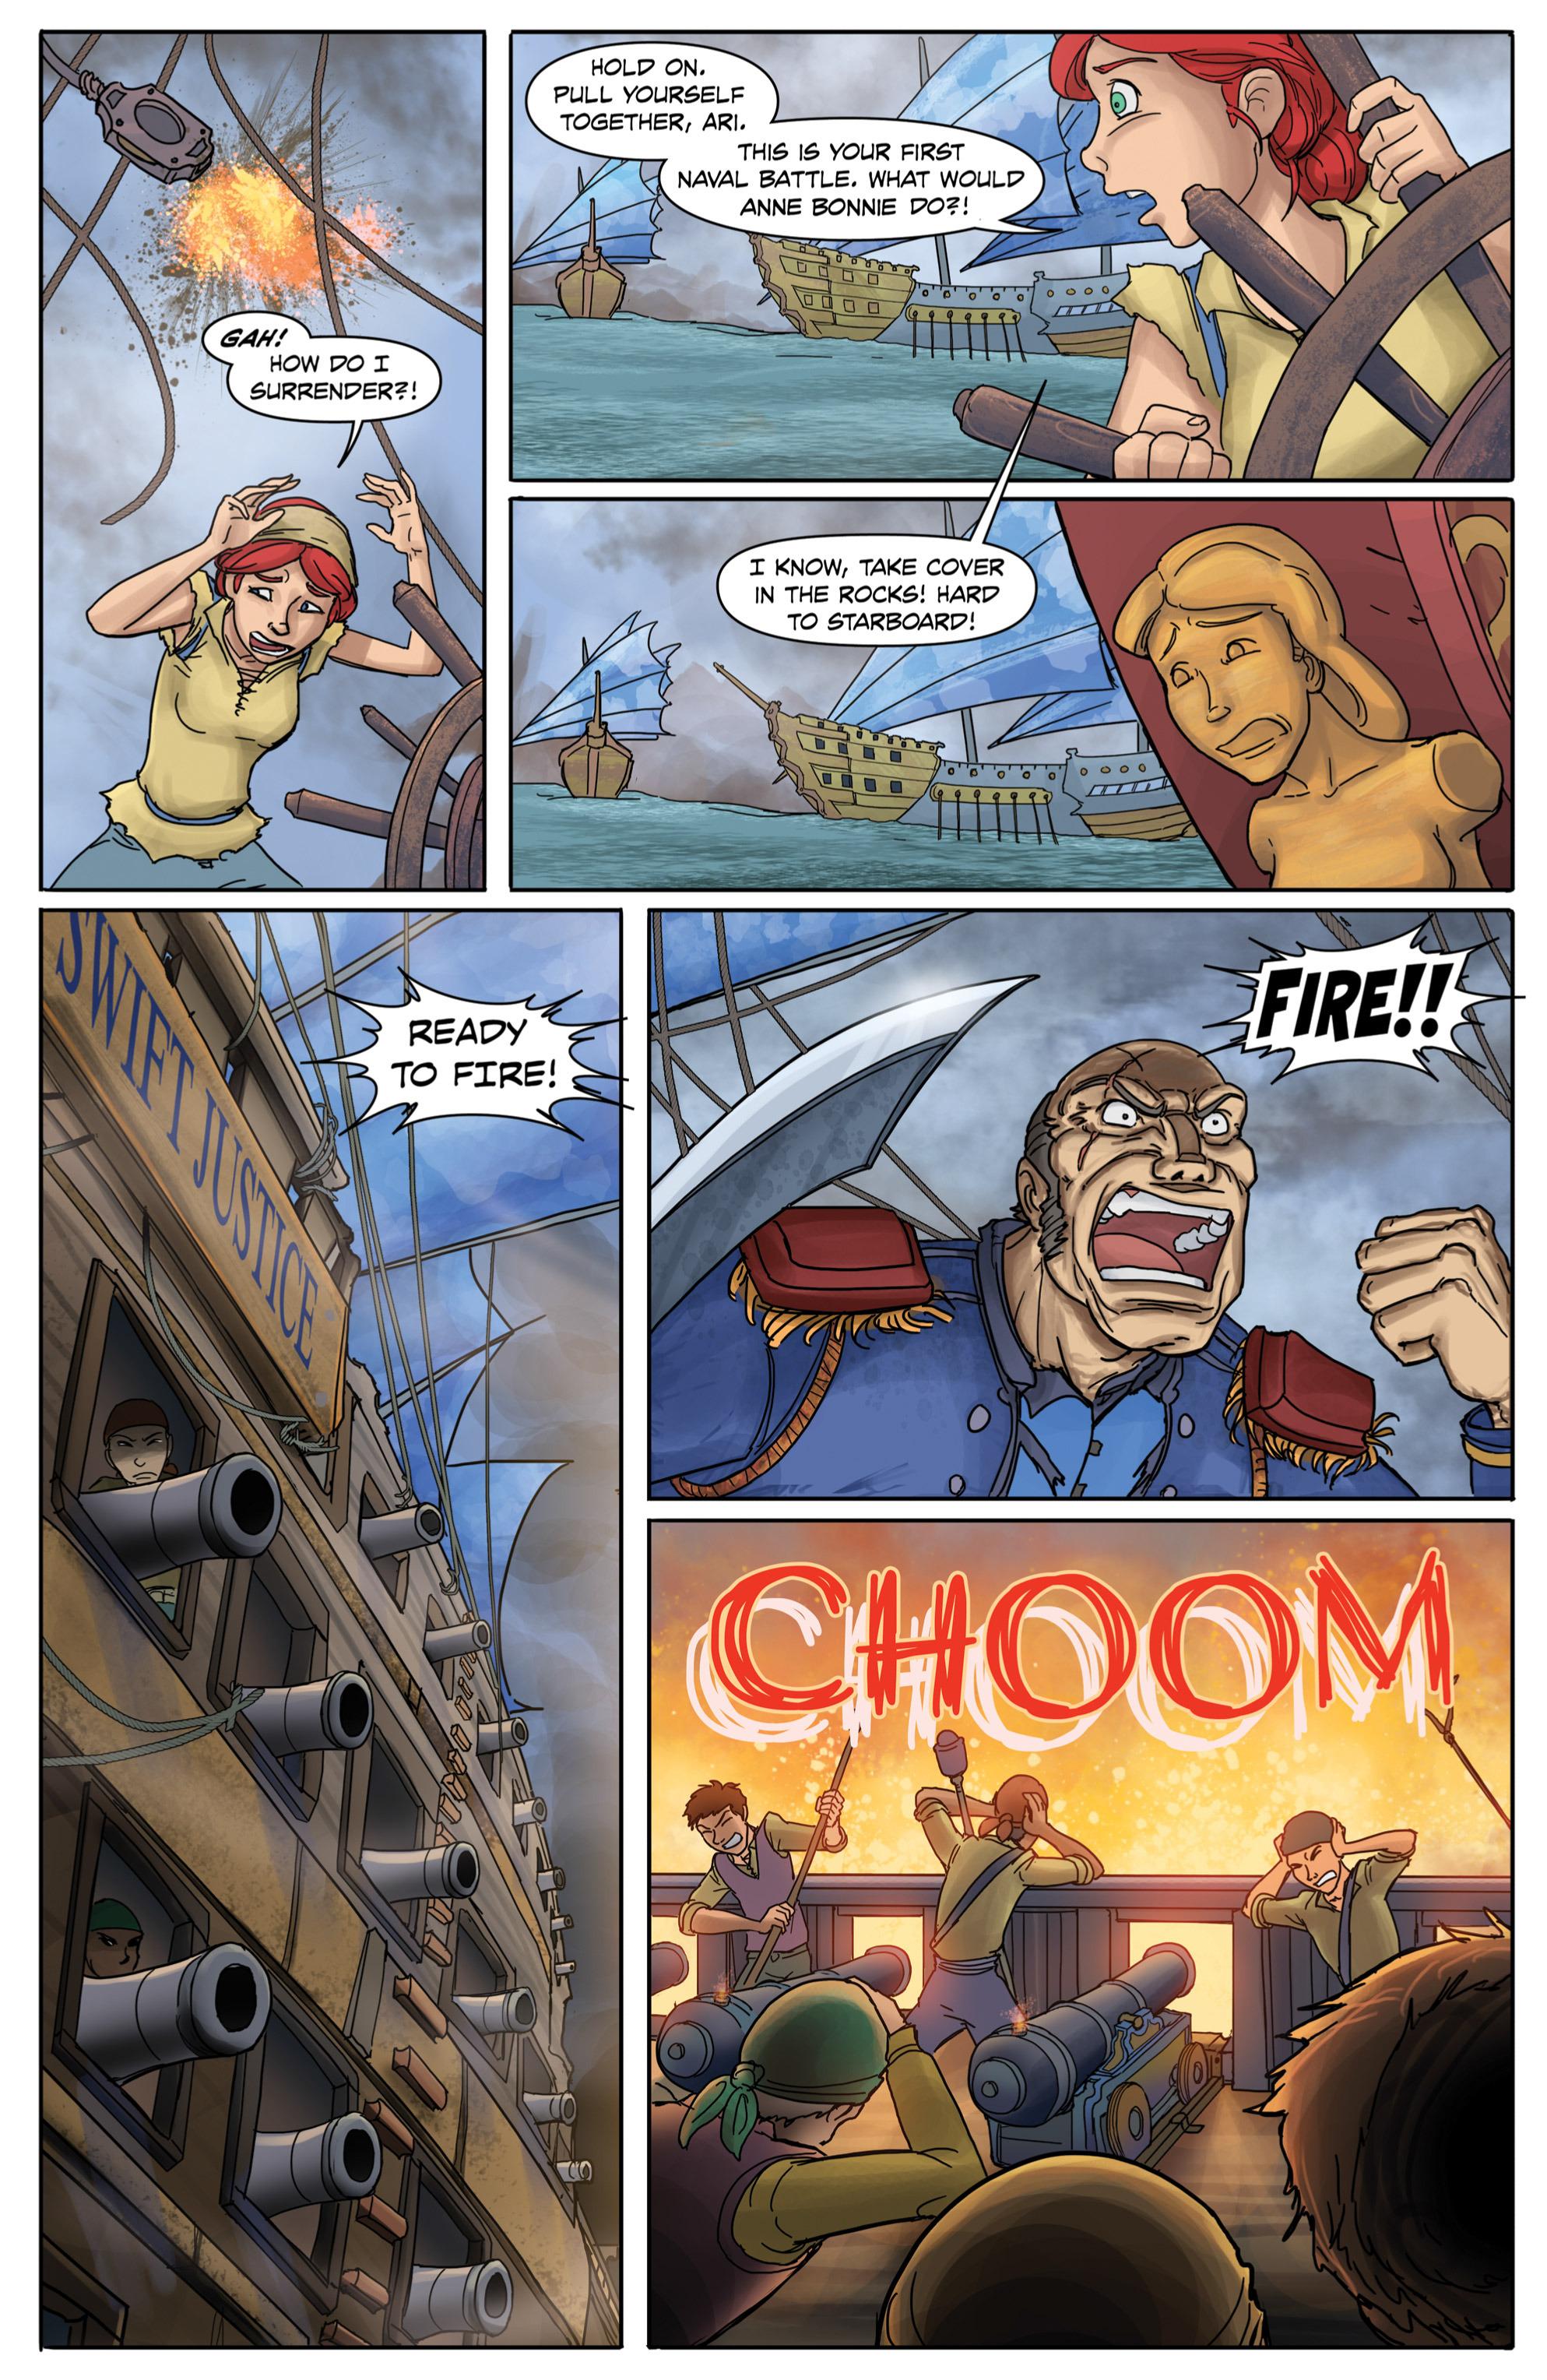 Read online Anne Bonnie comic -  Issue #2 - 6